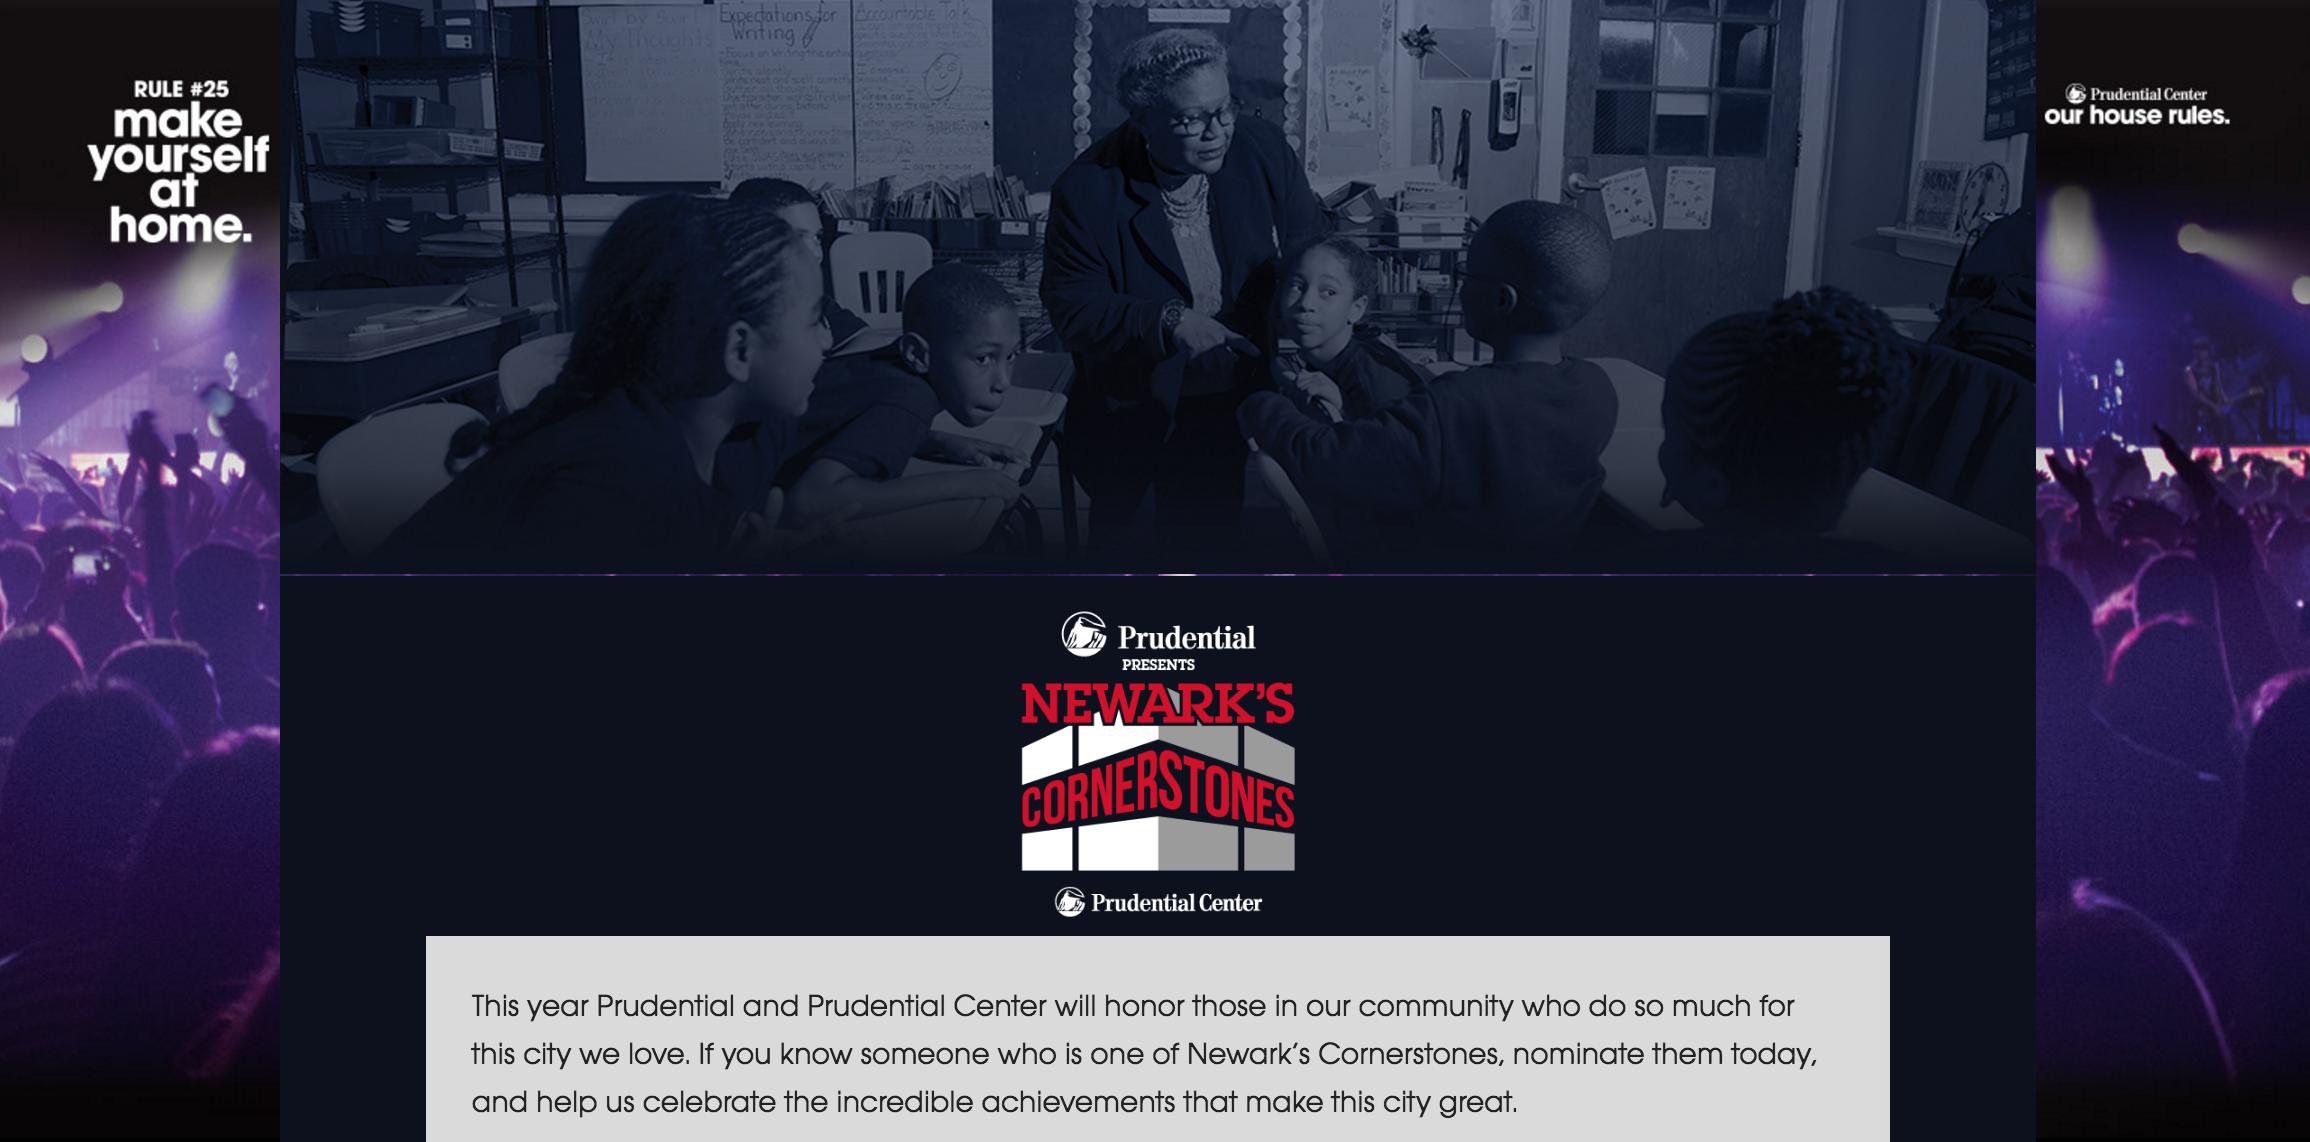 The Newark's Cornerstones nomination page at PruCenter.com/newarkscornerstones.